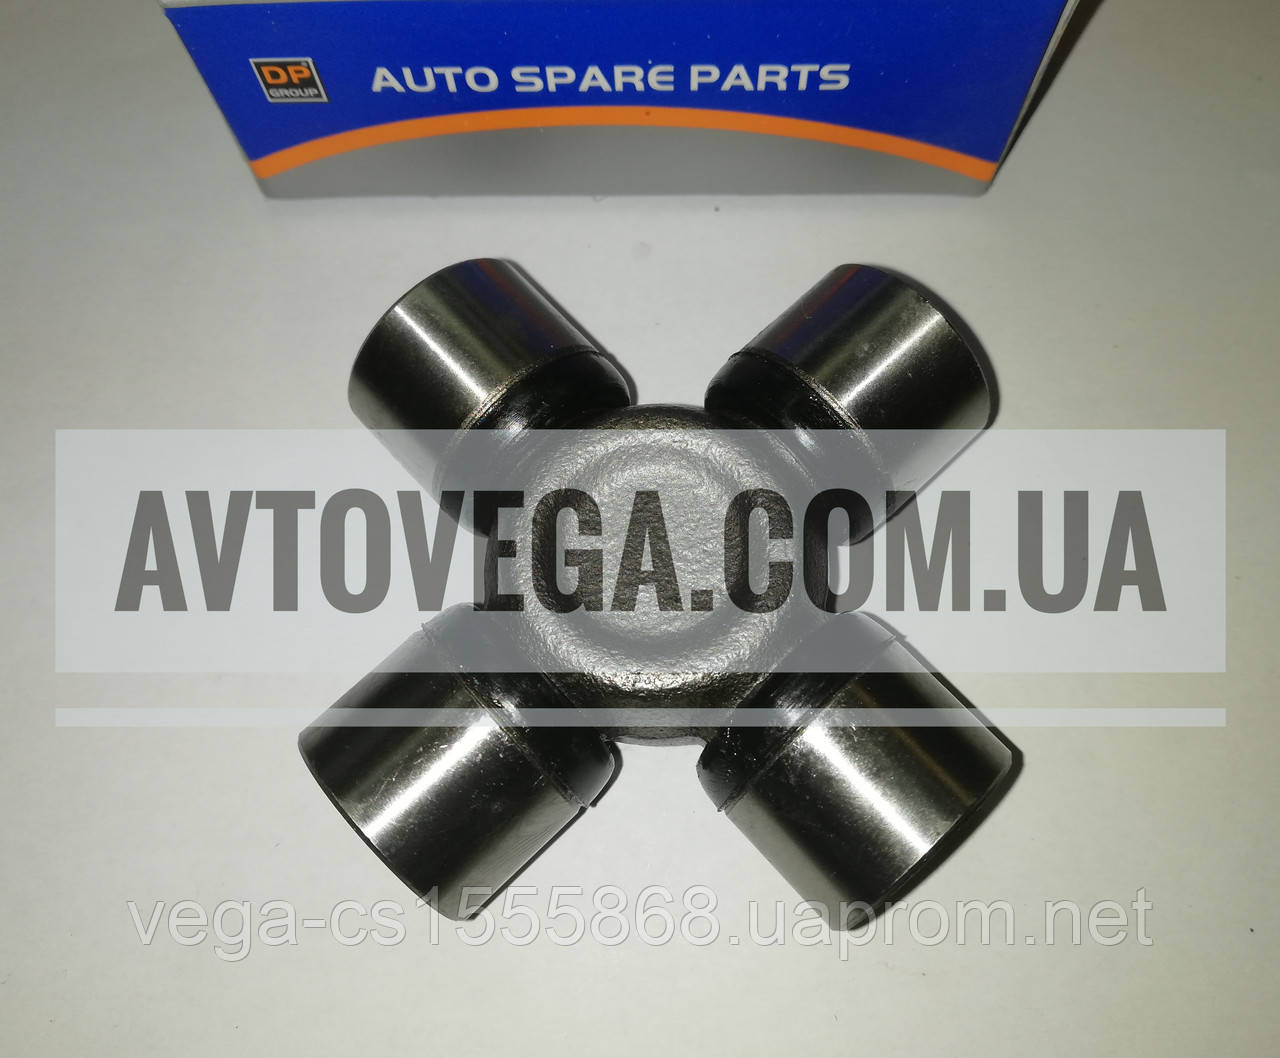 Хрестовина кардана 22X67 DP GROUP DS1419 на Ford Sierra Scorpio / Сієрра Скорпіо